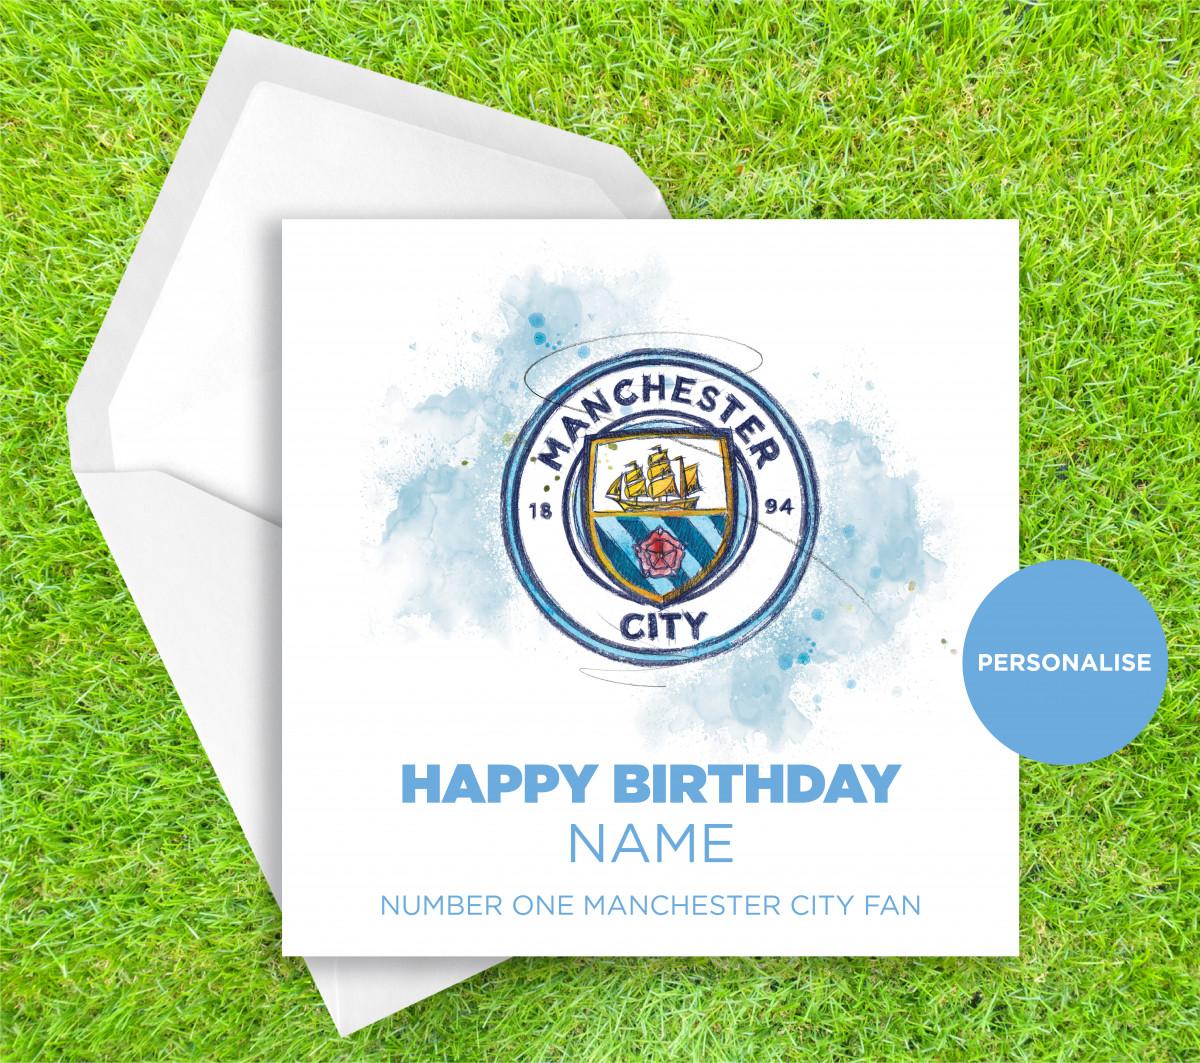 0254 Dm Manchester City Badge Greetingscard Greetingscard 1 Web